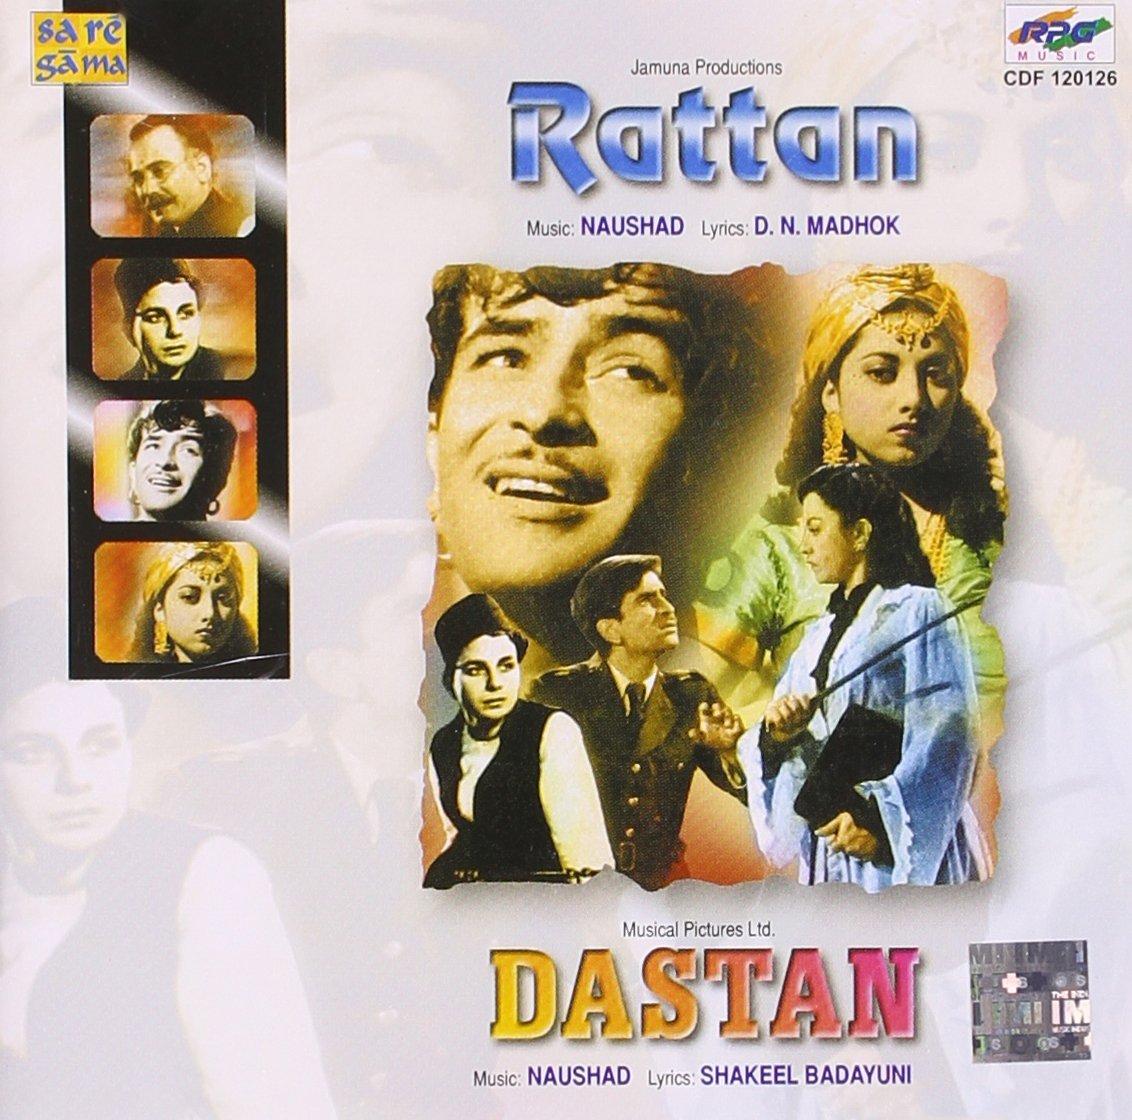 Rattan/Dastan